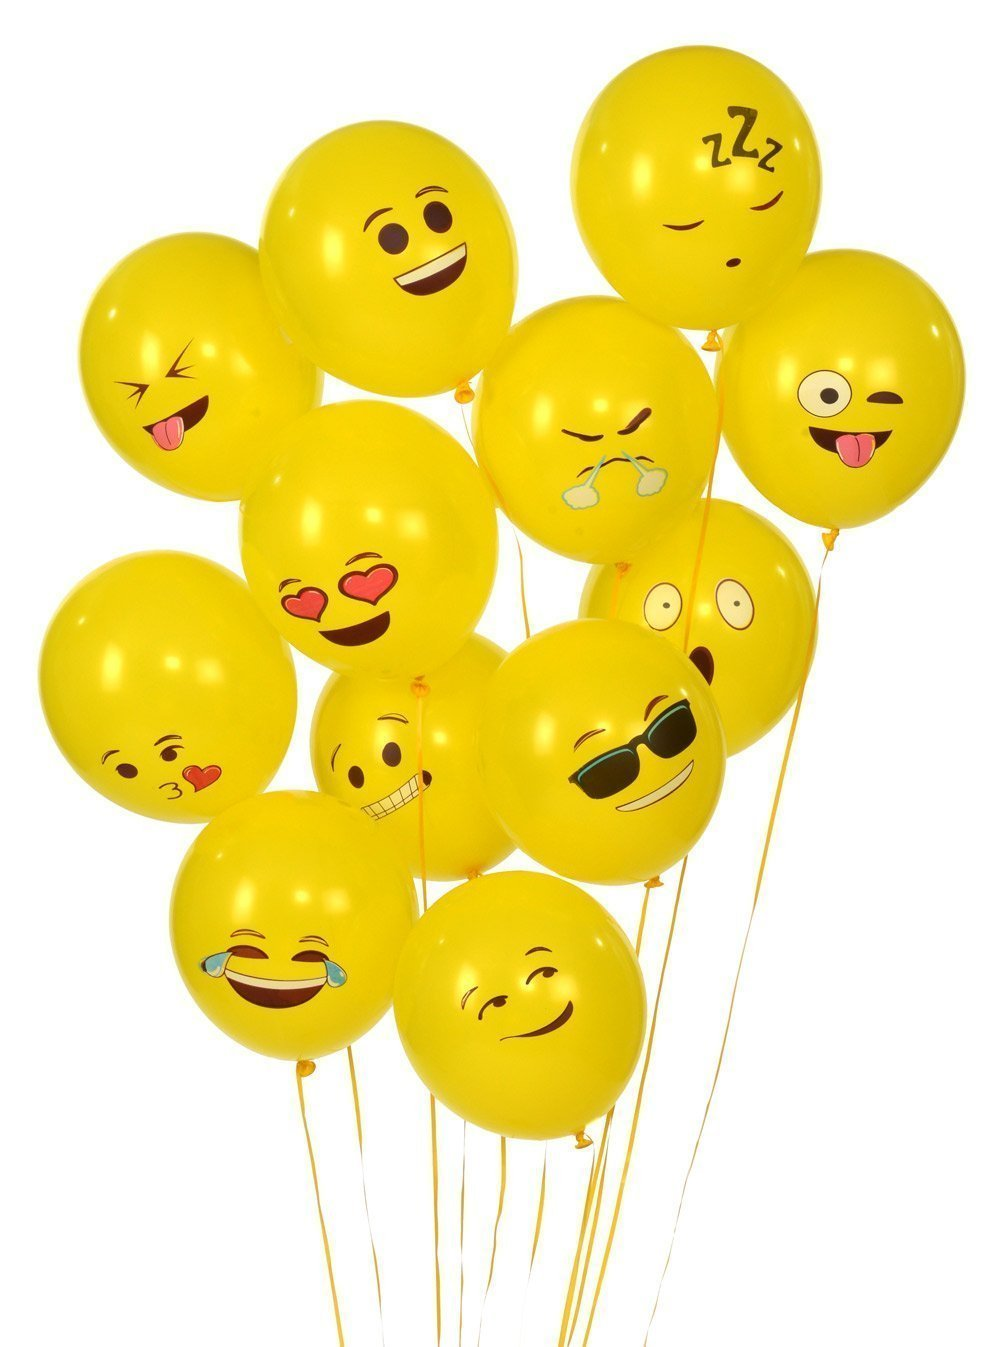 Etcbuys Emoji Mylar Party Balloons Supplies